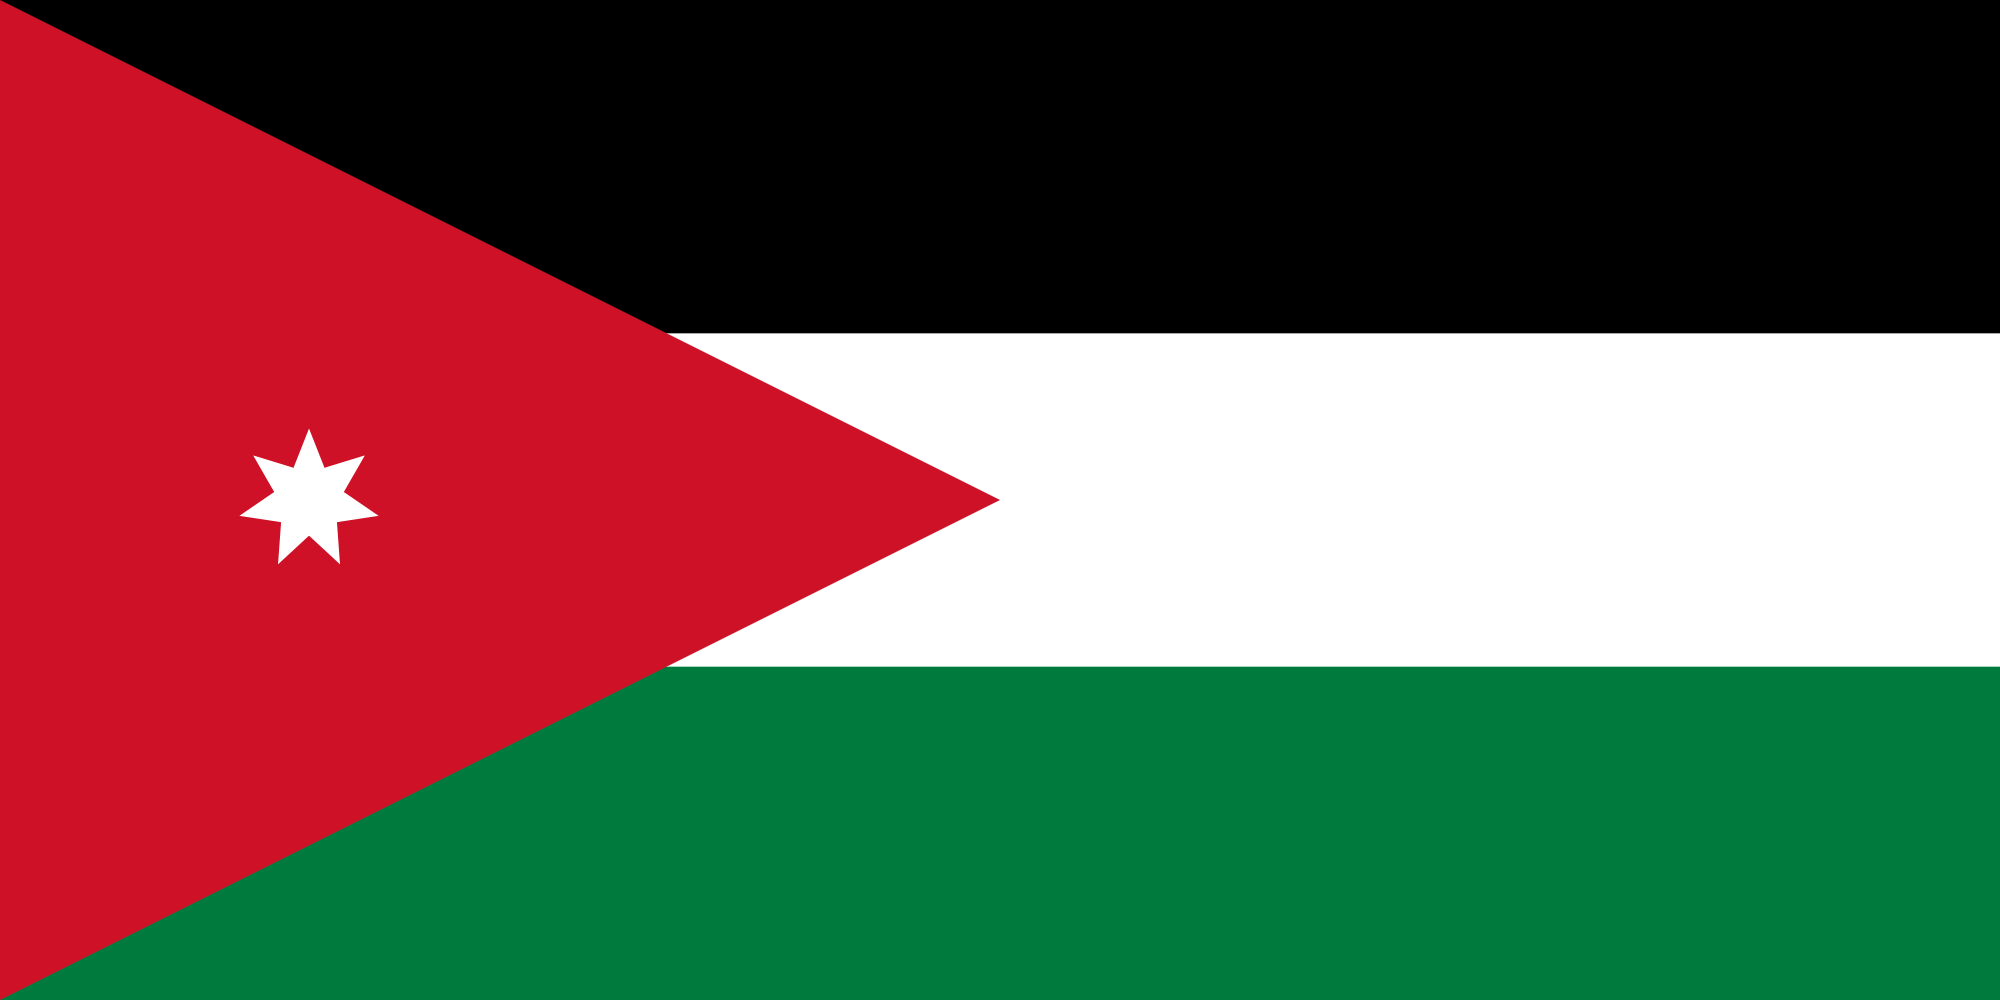 Jordan flag. Links to Jordan locations page.